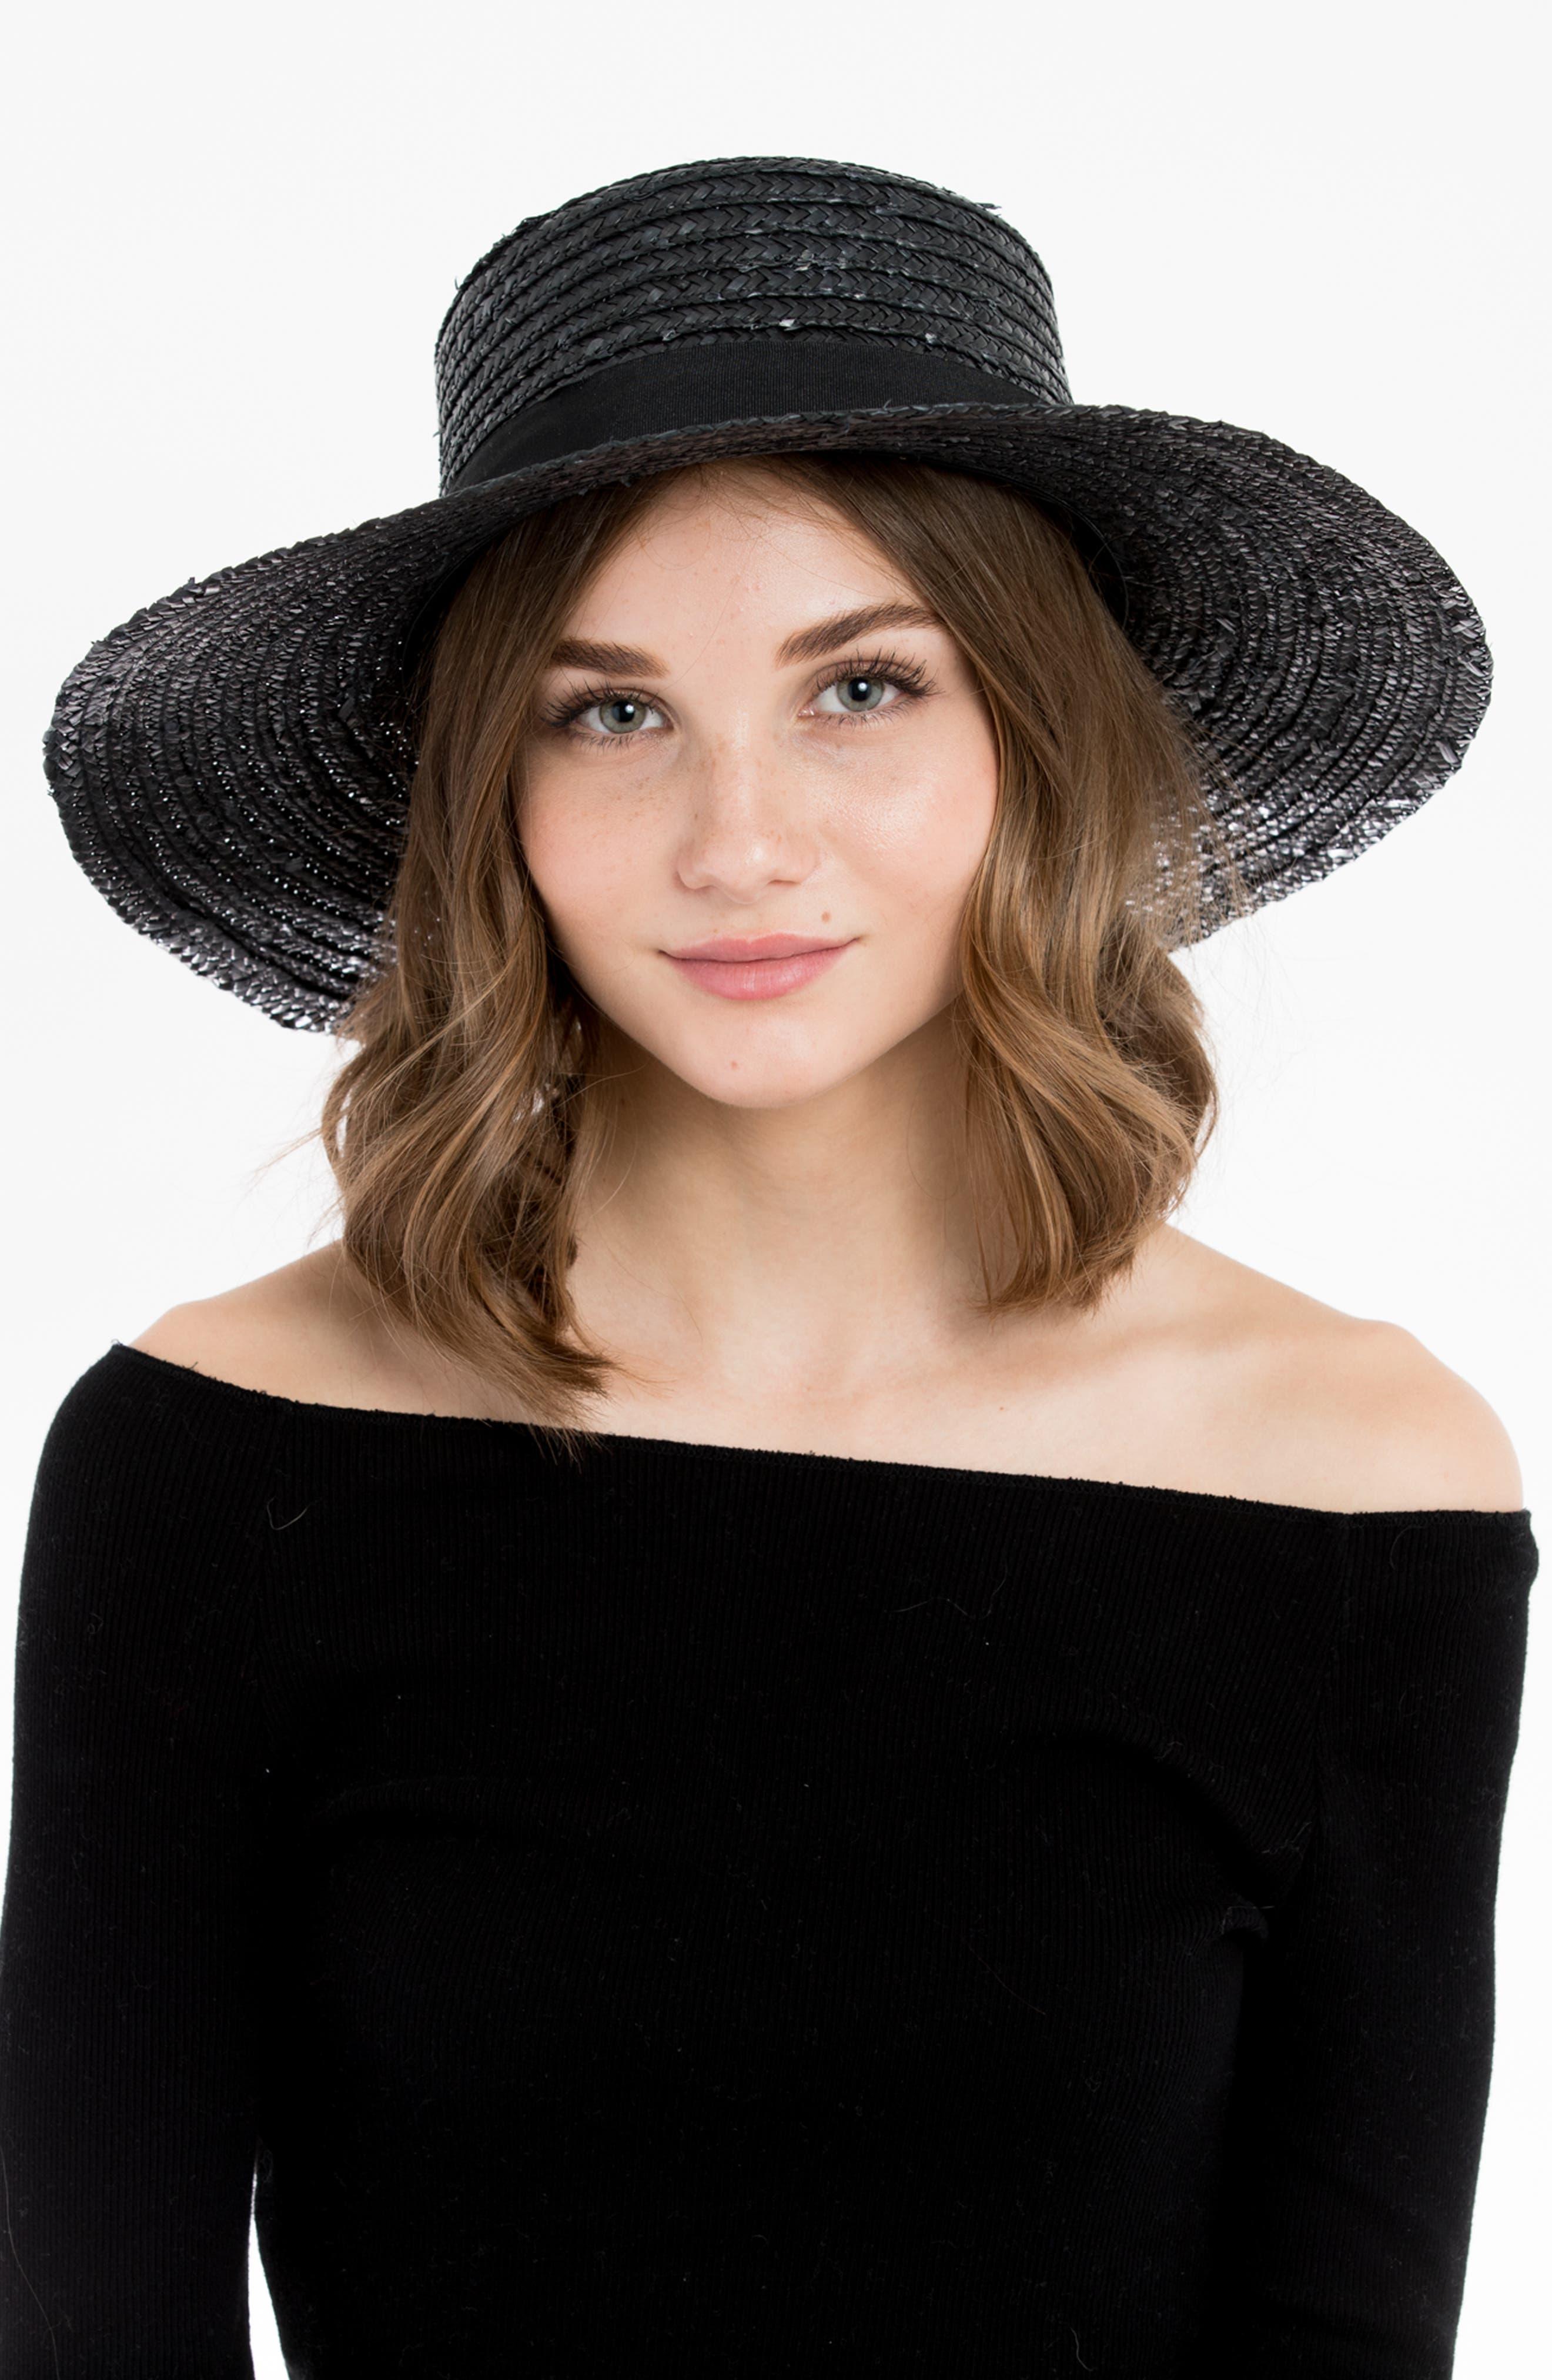 Lupe Straw Resort Hat,                             Alternate thumbnail 2, color,                             BLACK